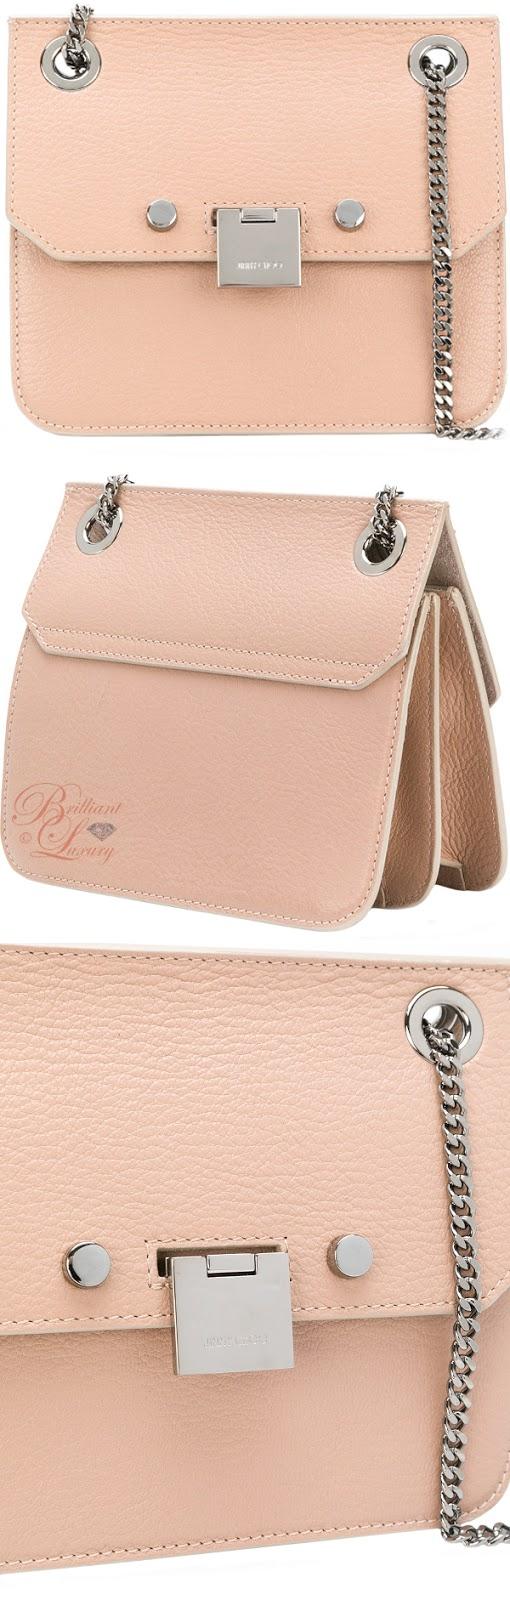 Brilliant Luxury ♦ Jimmy Choo mini Rebel crossbody bag